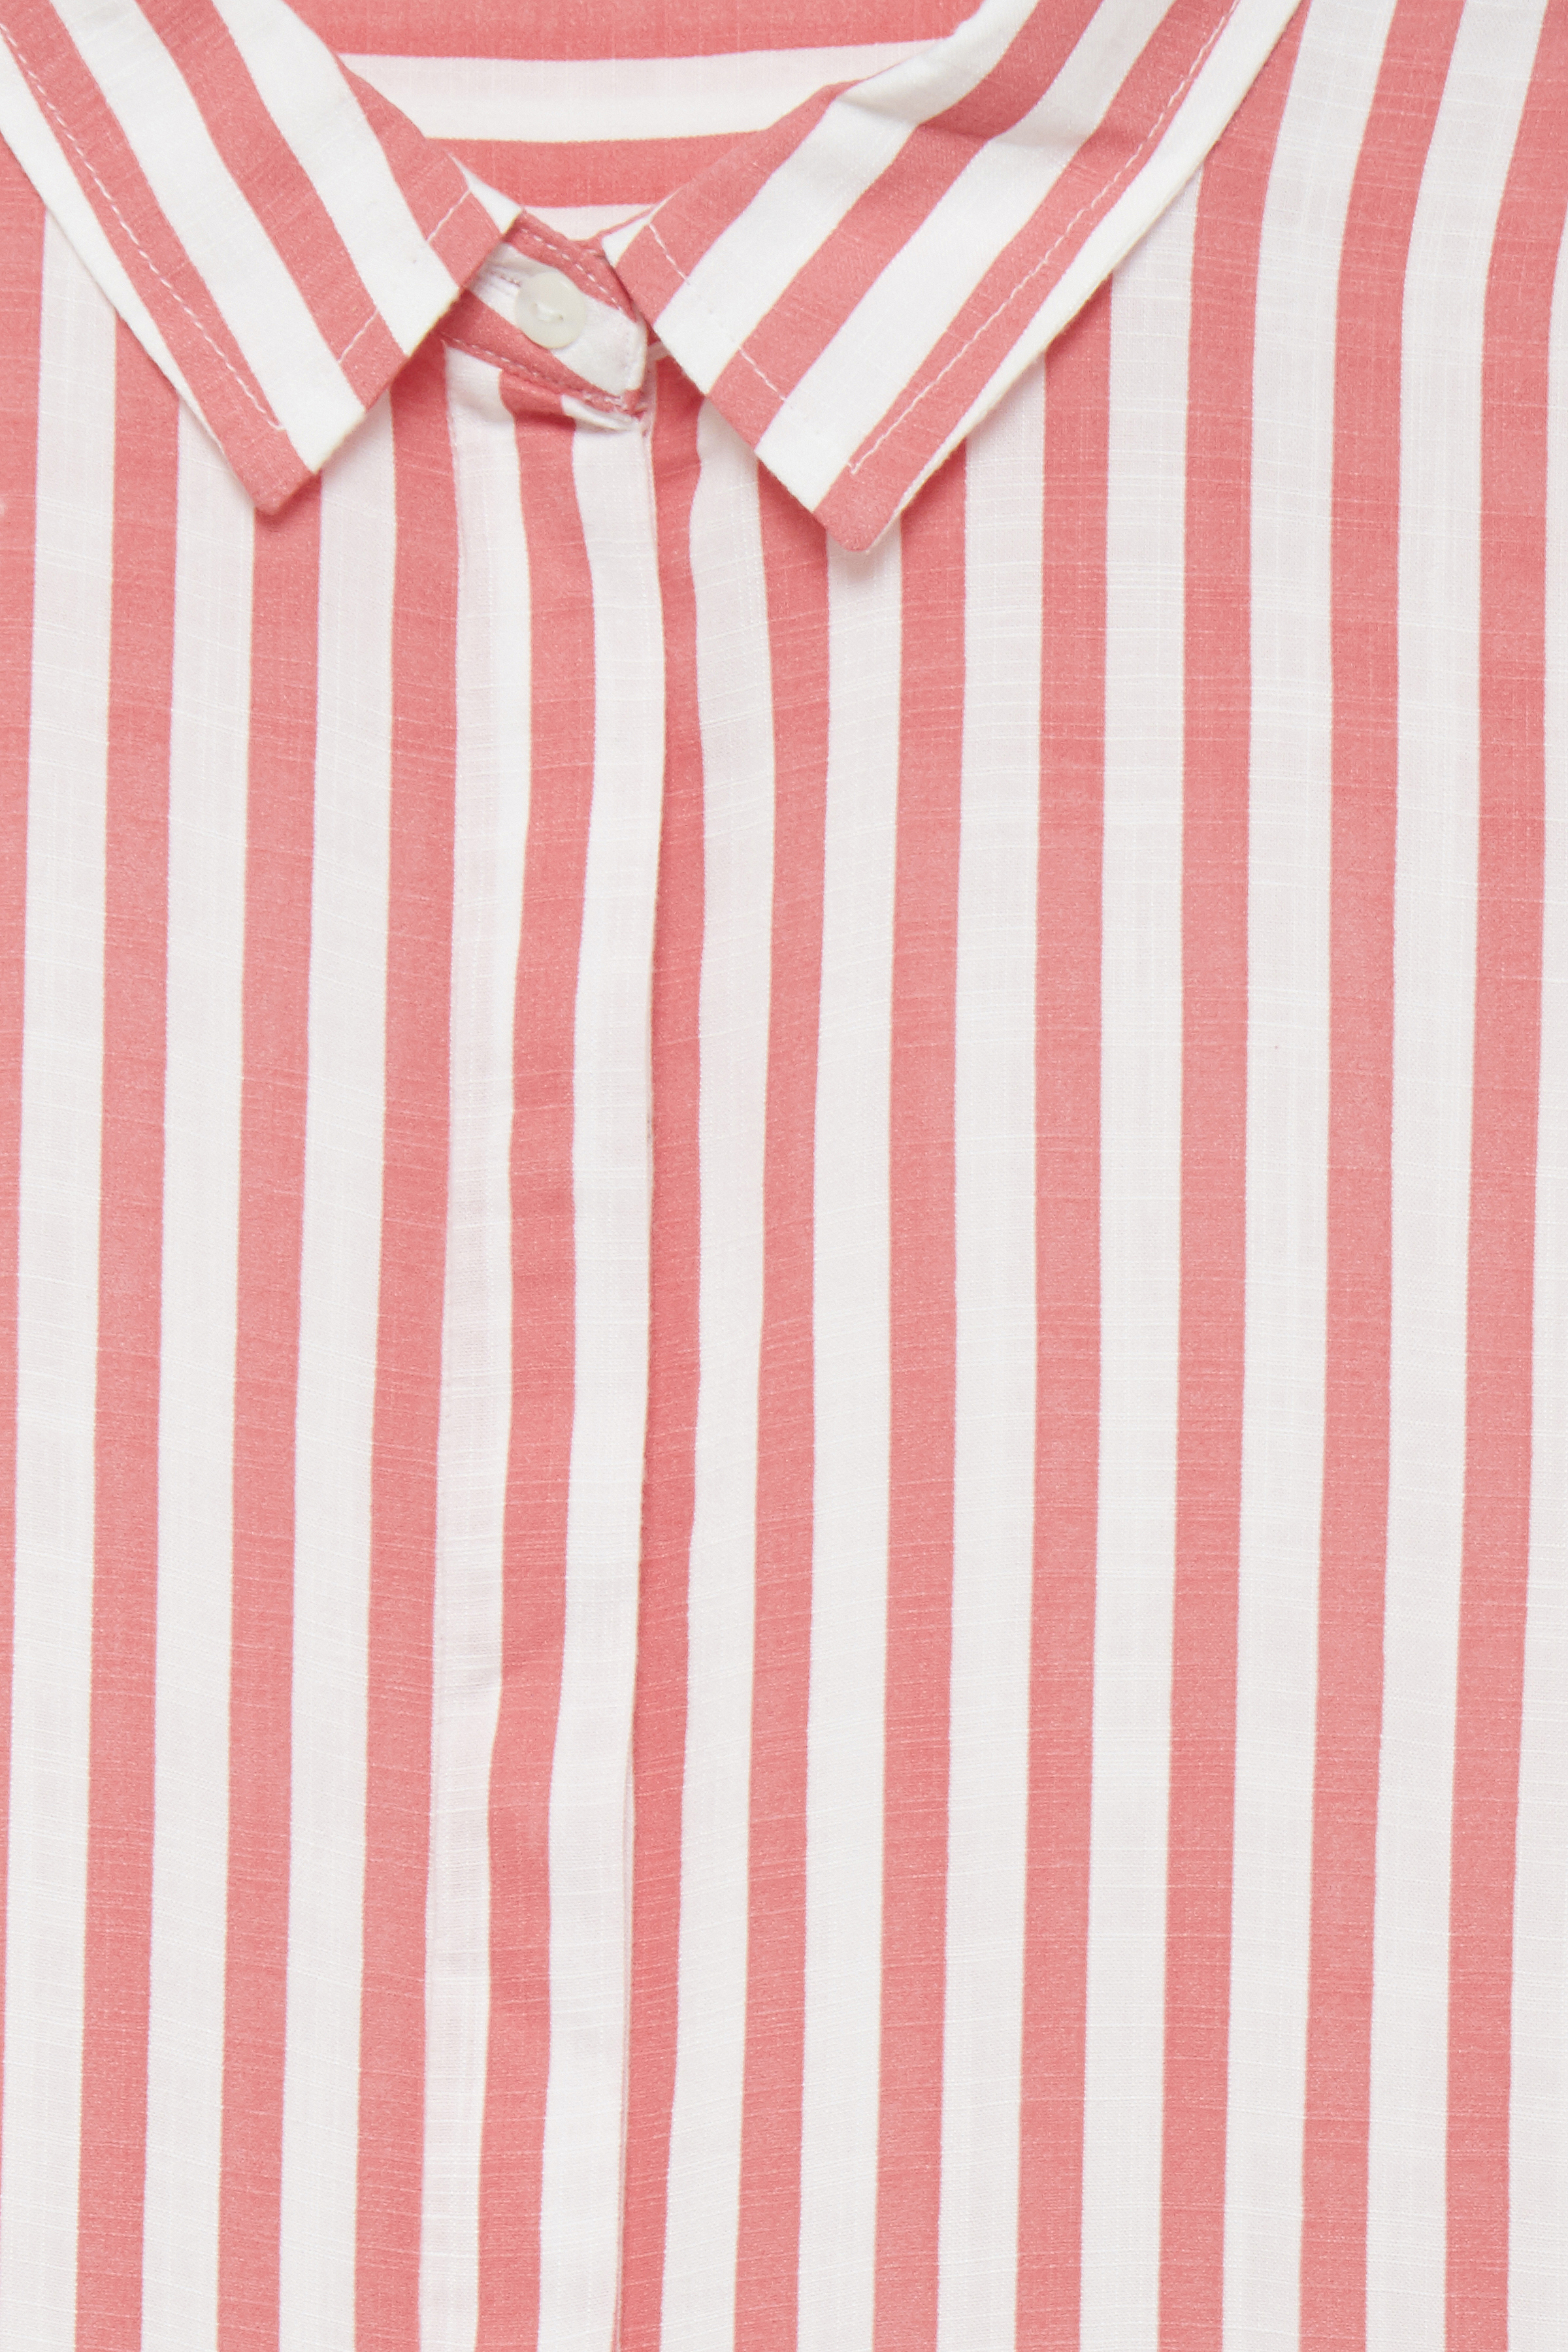 Sunkist Coral combi Langarm - Hemd von b.young – Kaufen Sie Sunkist Coral combi Langarm - Hemd aus Größe 34-44 hier